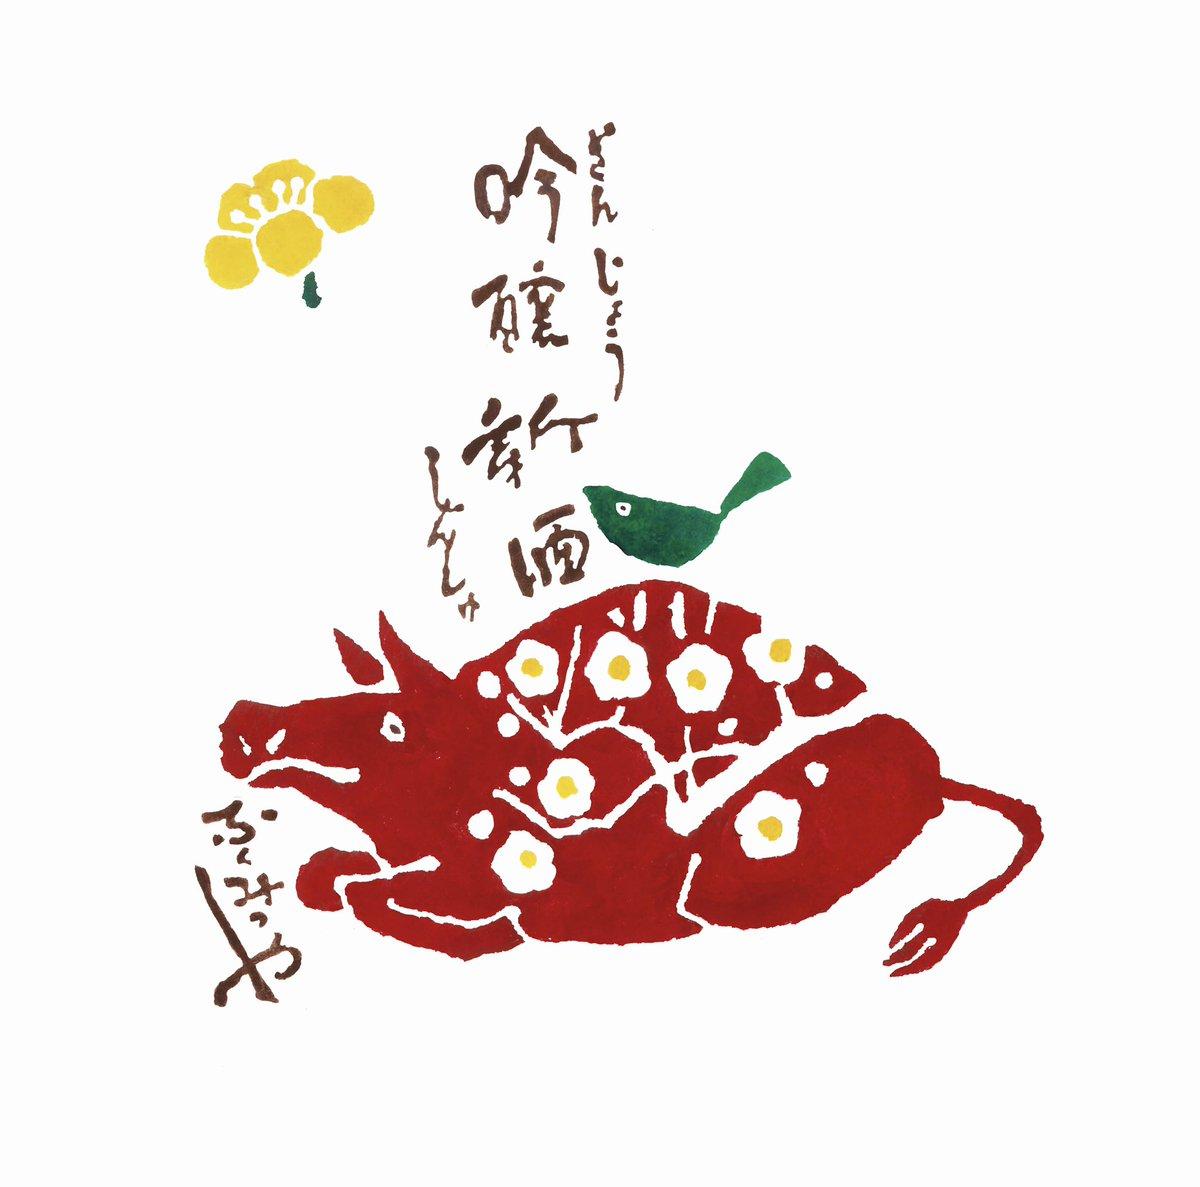 test ツイッターメディア - 金沢の酒蔵 福光屋の「福正宗 酒歳時記」のラベルの挿絵を今季より担当させて頂くことになりました。  「酒歳時記」はこれまで吉田カツさん、牧野伊三夫さんが担当された歴史あるシリーズで、上手にバトンを繋げられるように努めたいと思います。 https://t.co/VzkWth7Z5F https://t.co/PORQvNbq8i